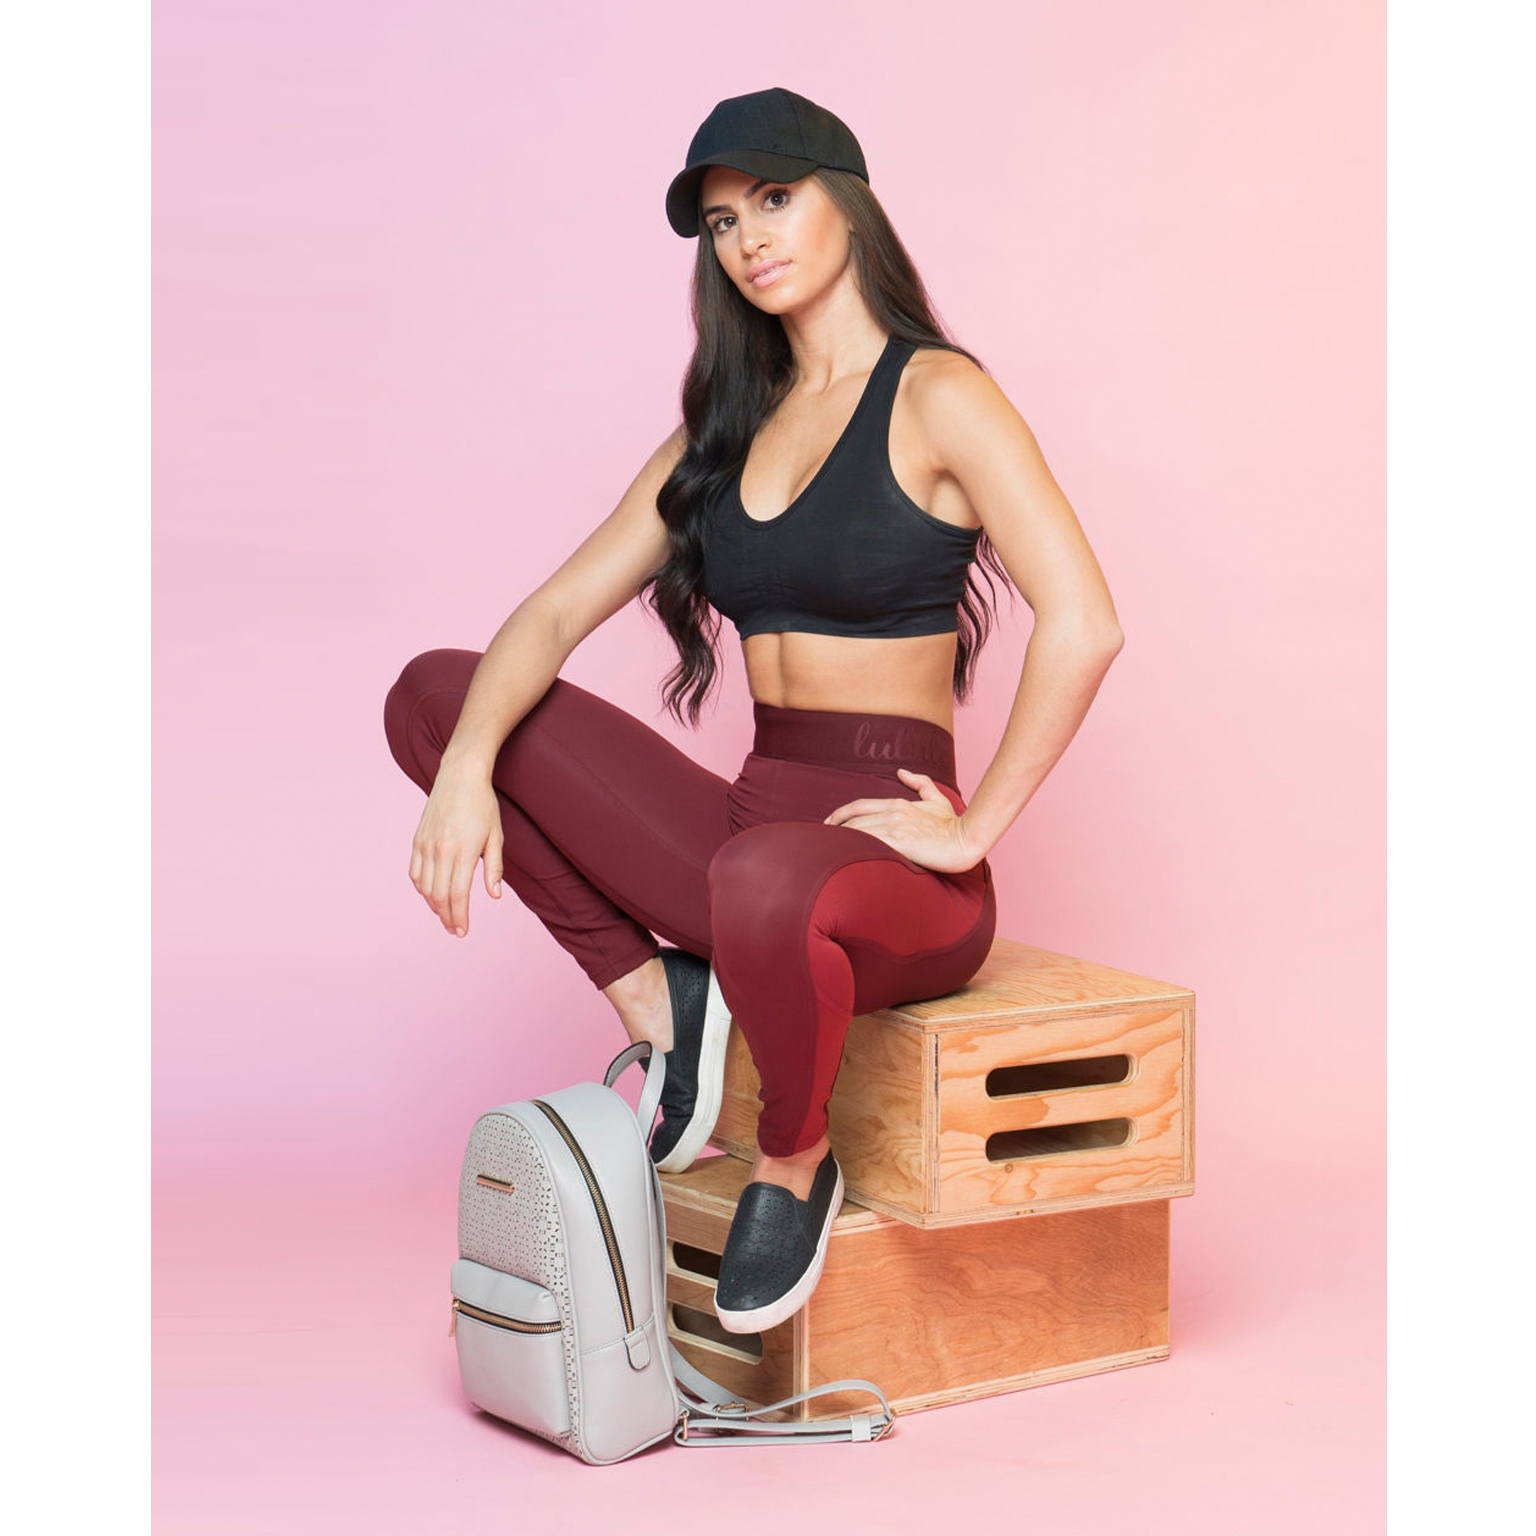 Toronto-Fitness-Model-Agency-Fashion-Casual-Commercial-Portrait-Elizabeth-Ruffolo